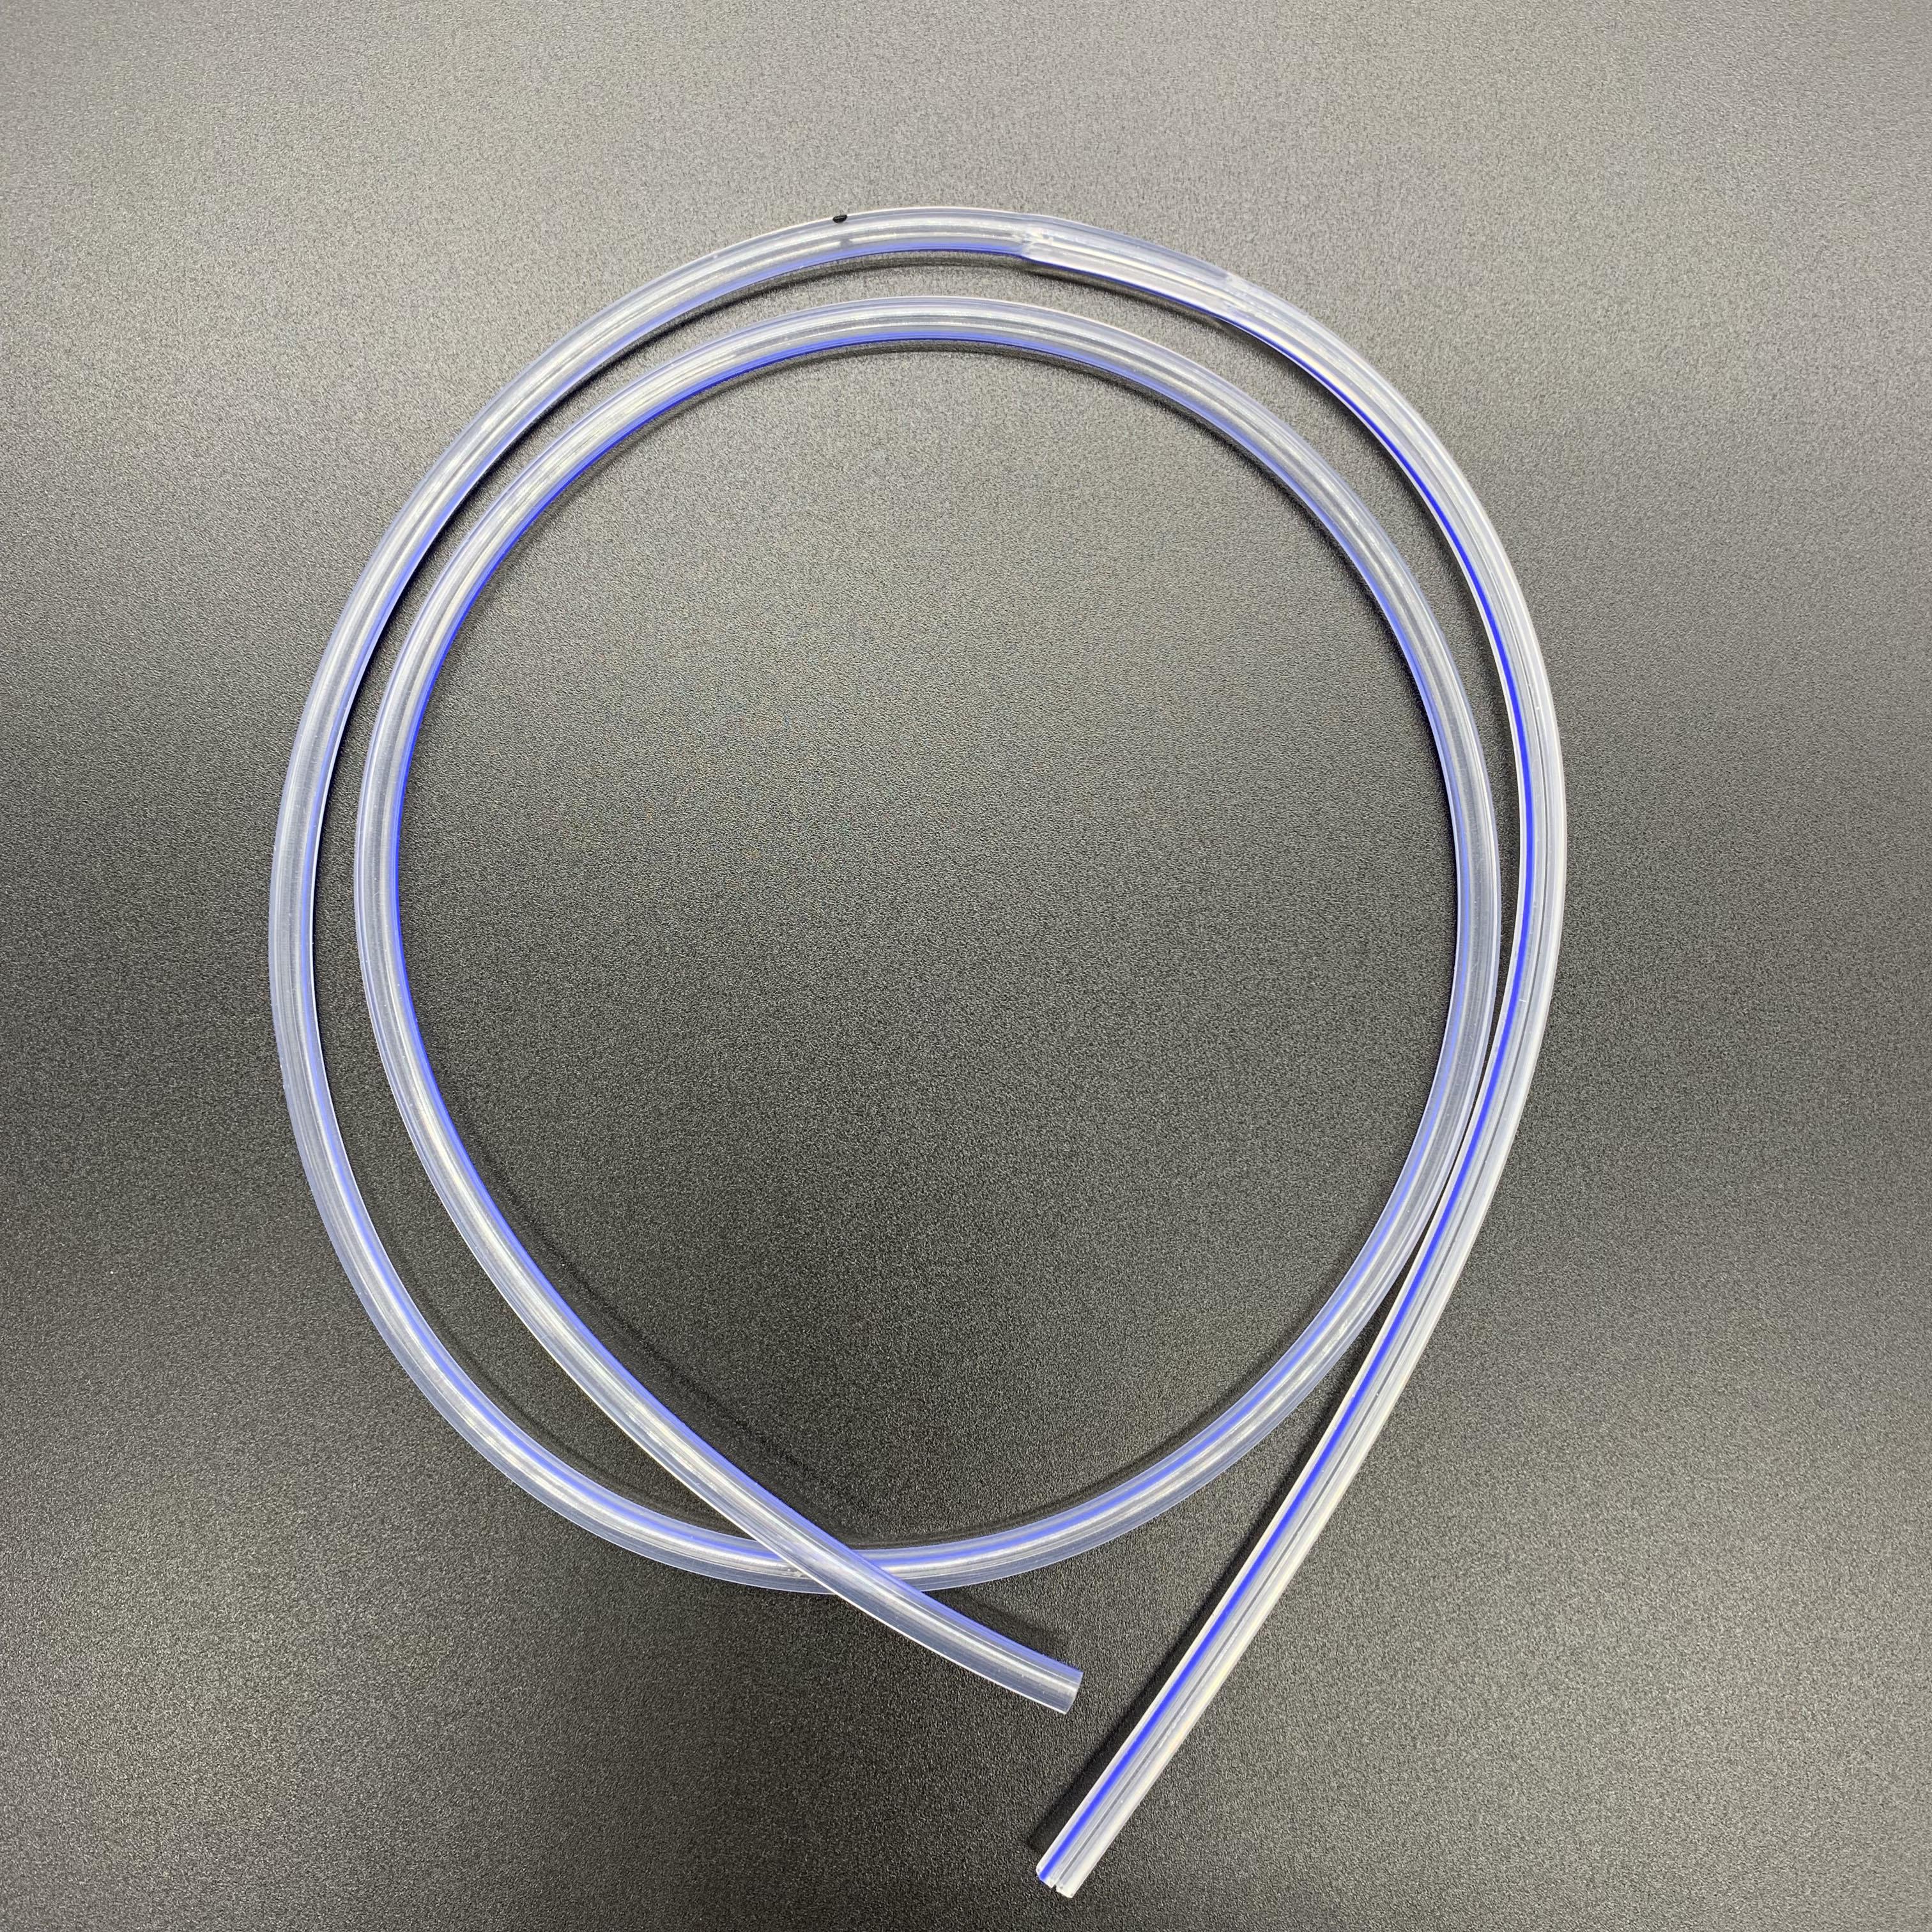 round perforated drain wound drainage tube round silicone tube